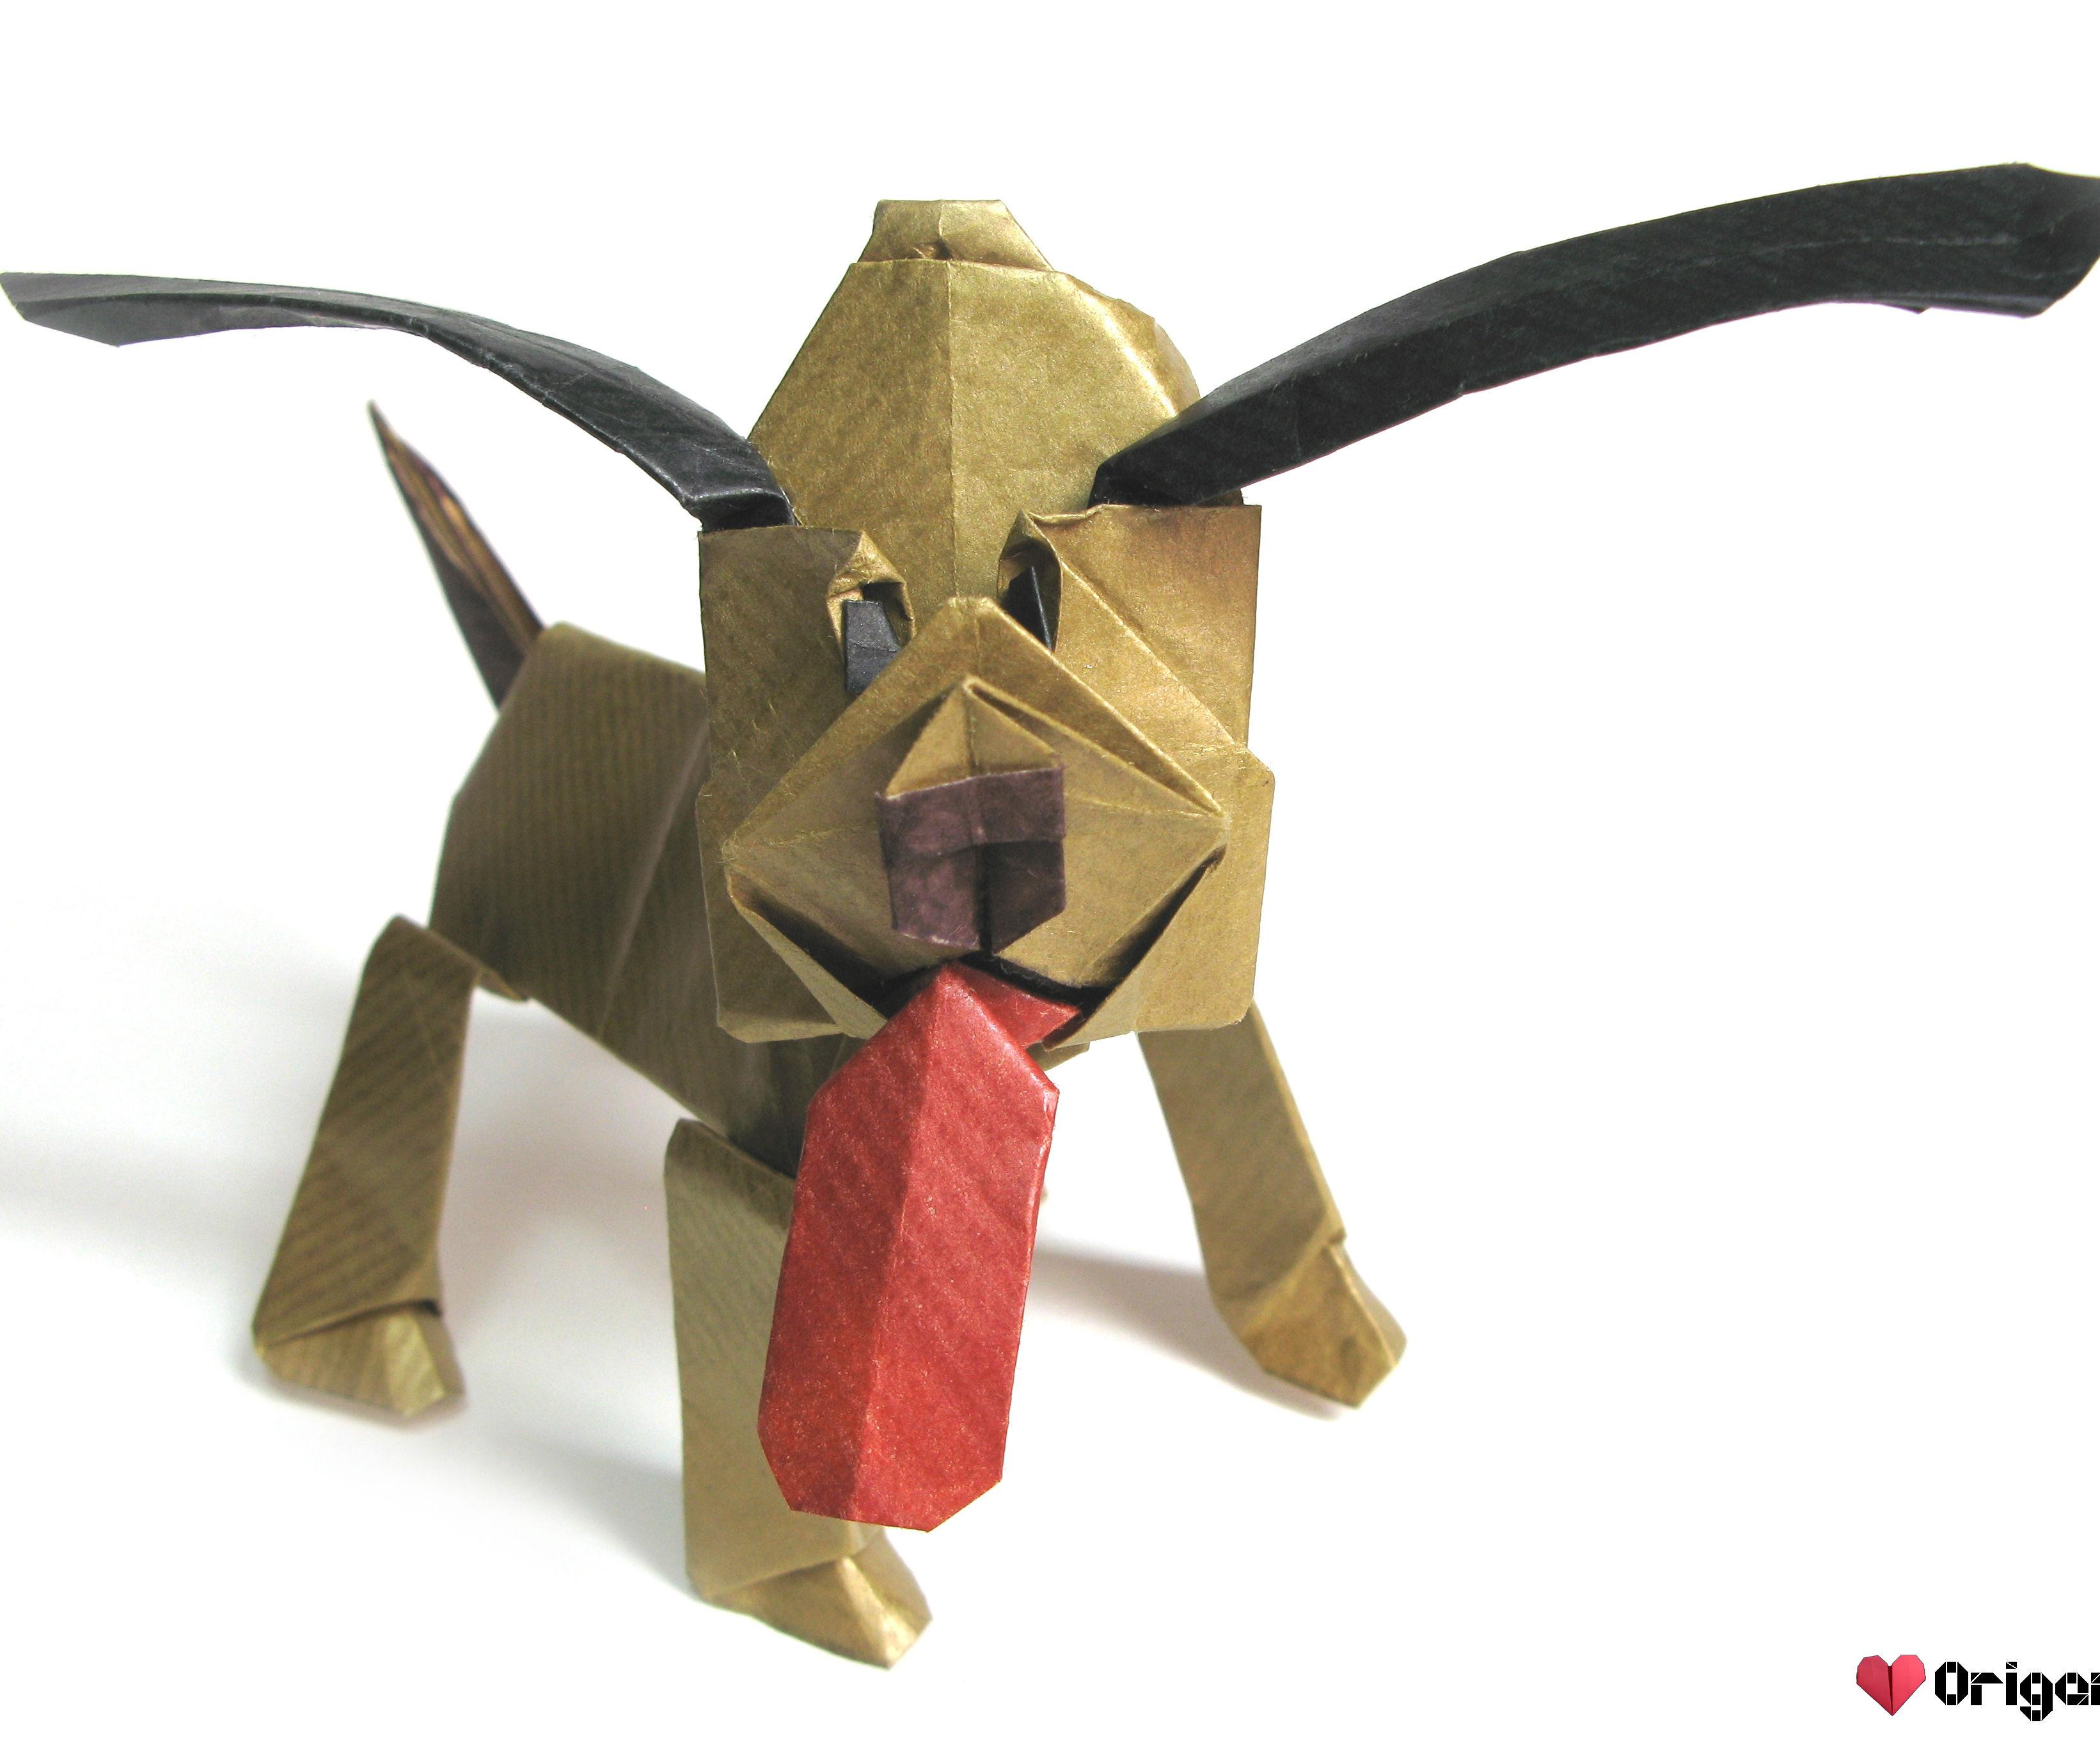 Origami Pluto the Dog